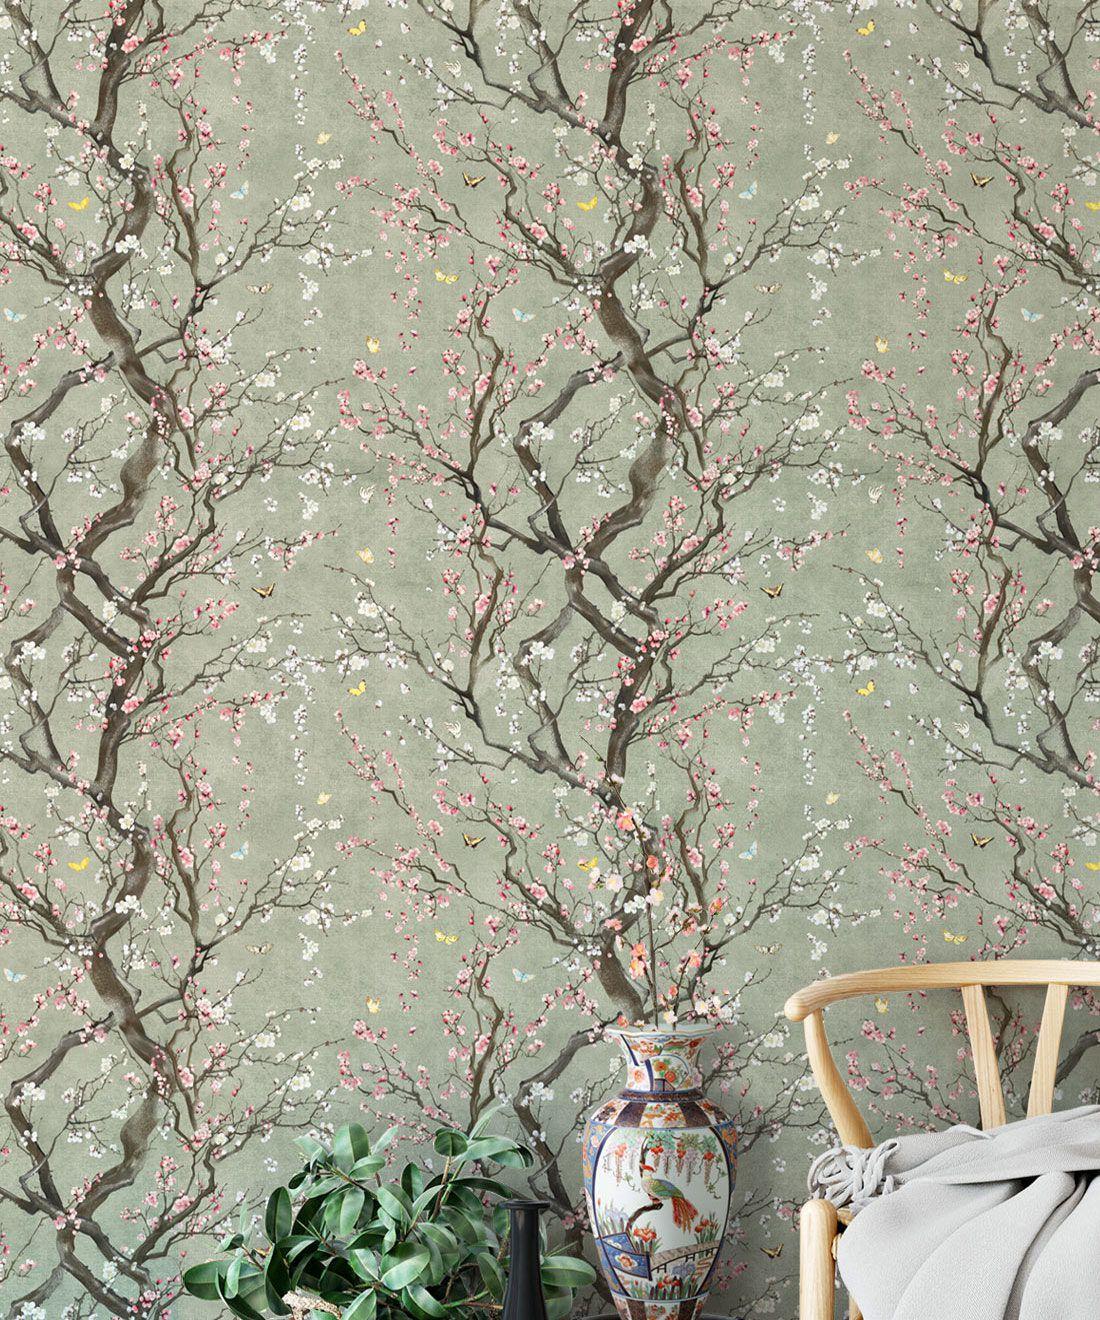 Plum Blossom Wallpaper • Chintzy Wallpaper